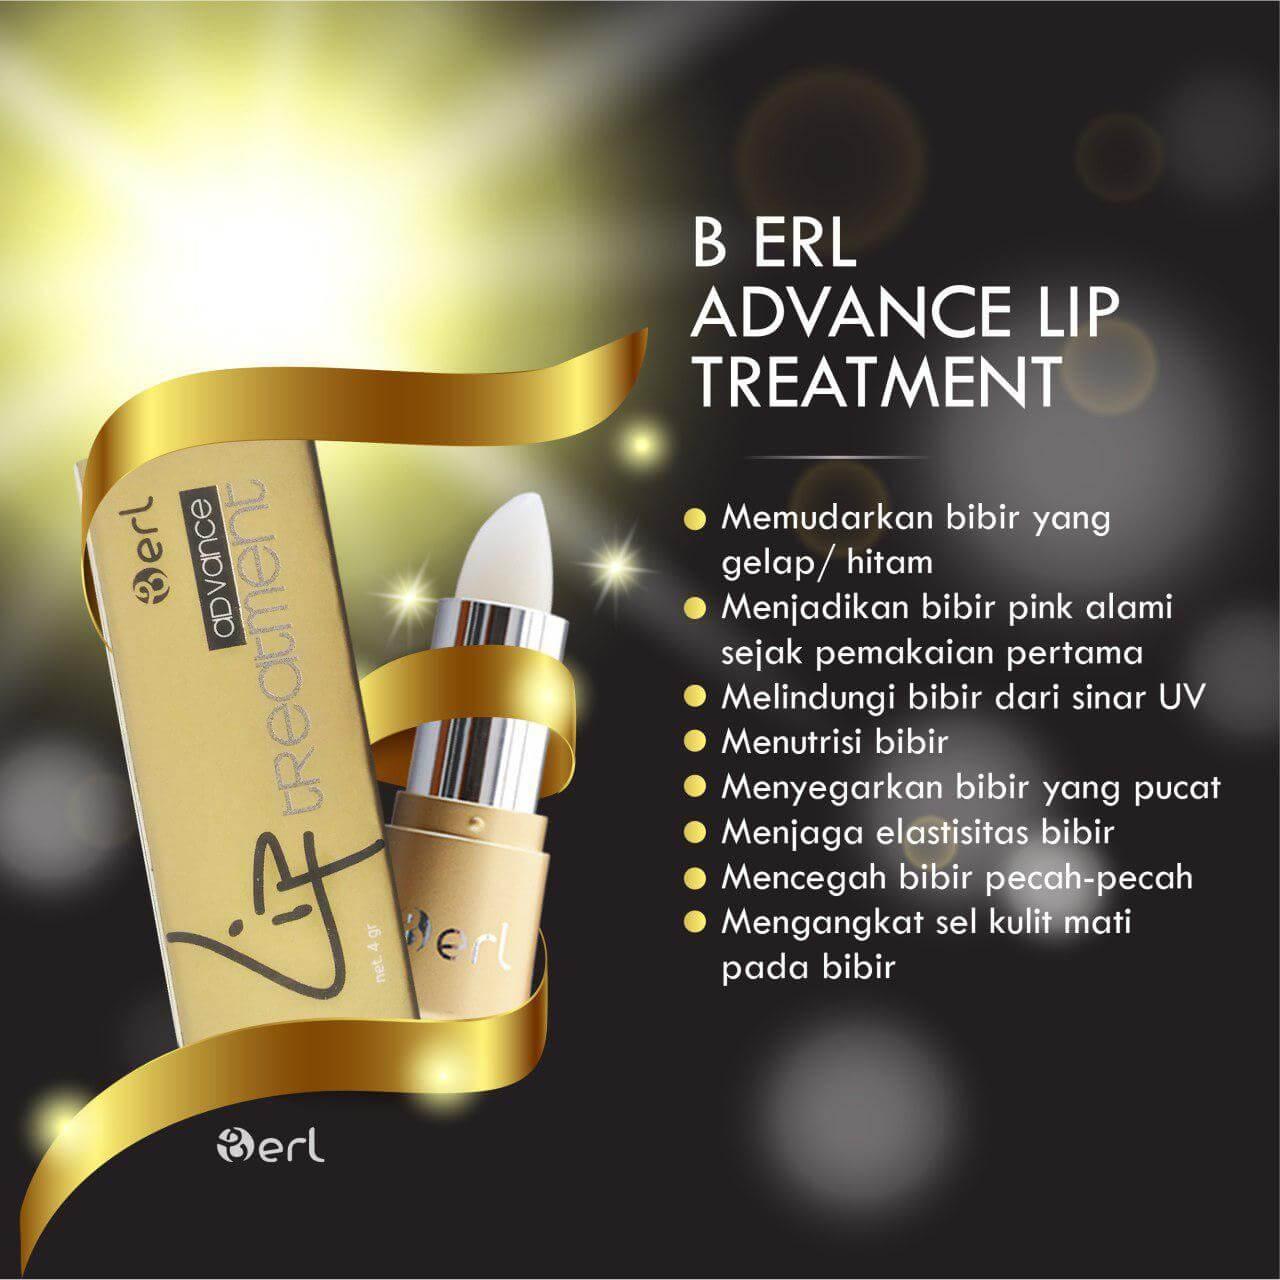 ADVANCE LIP TREATMENT